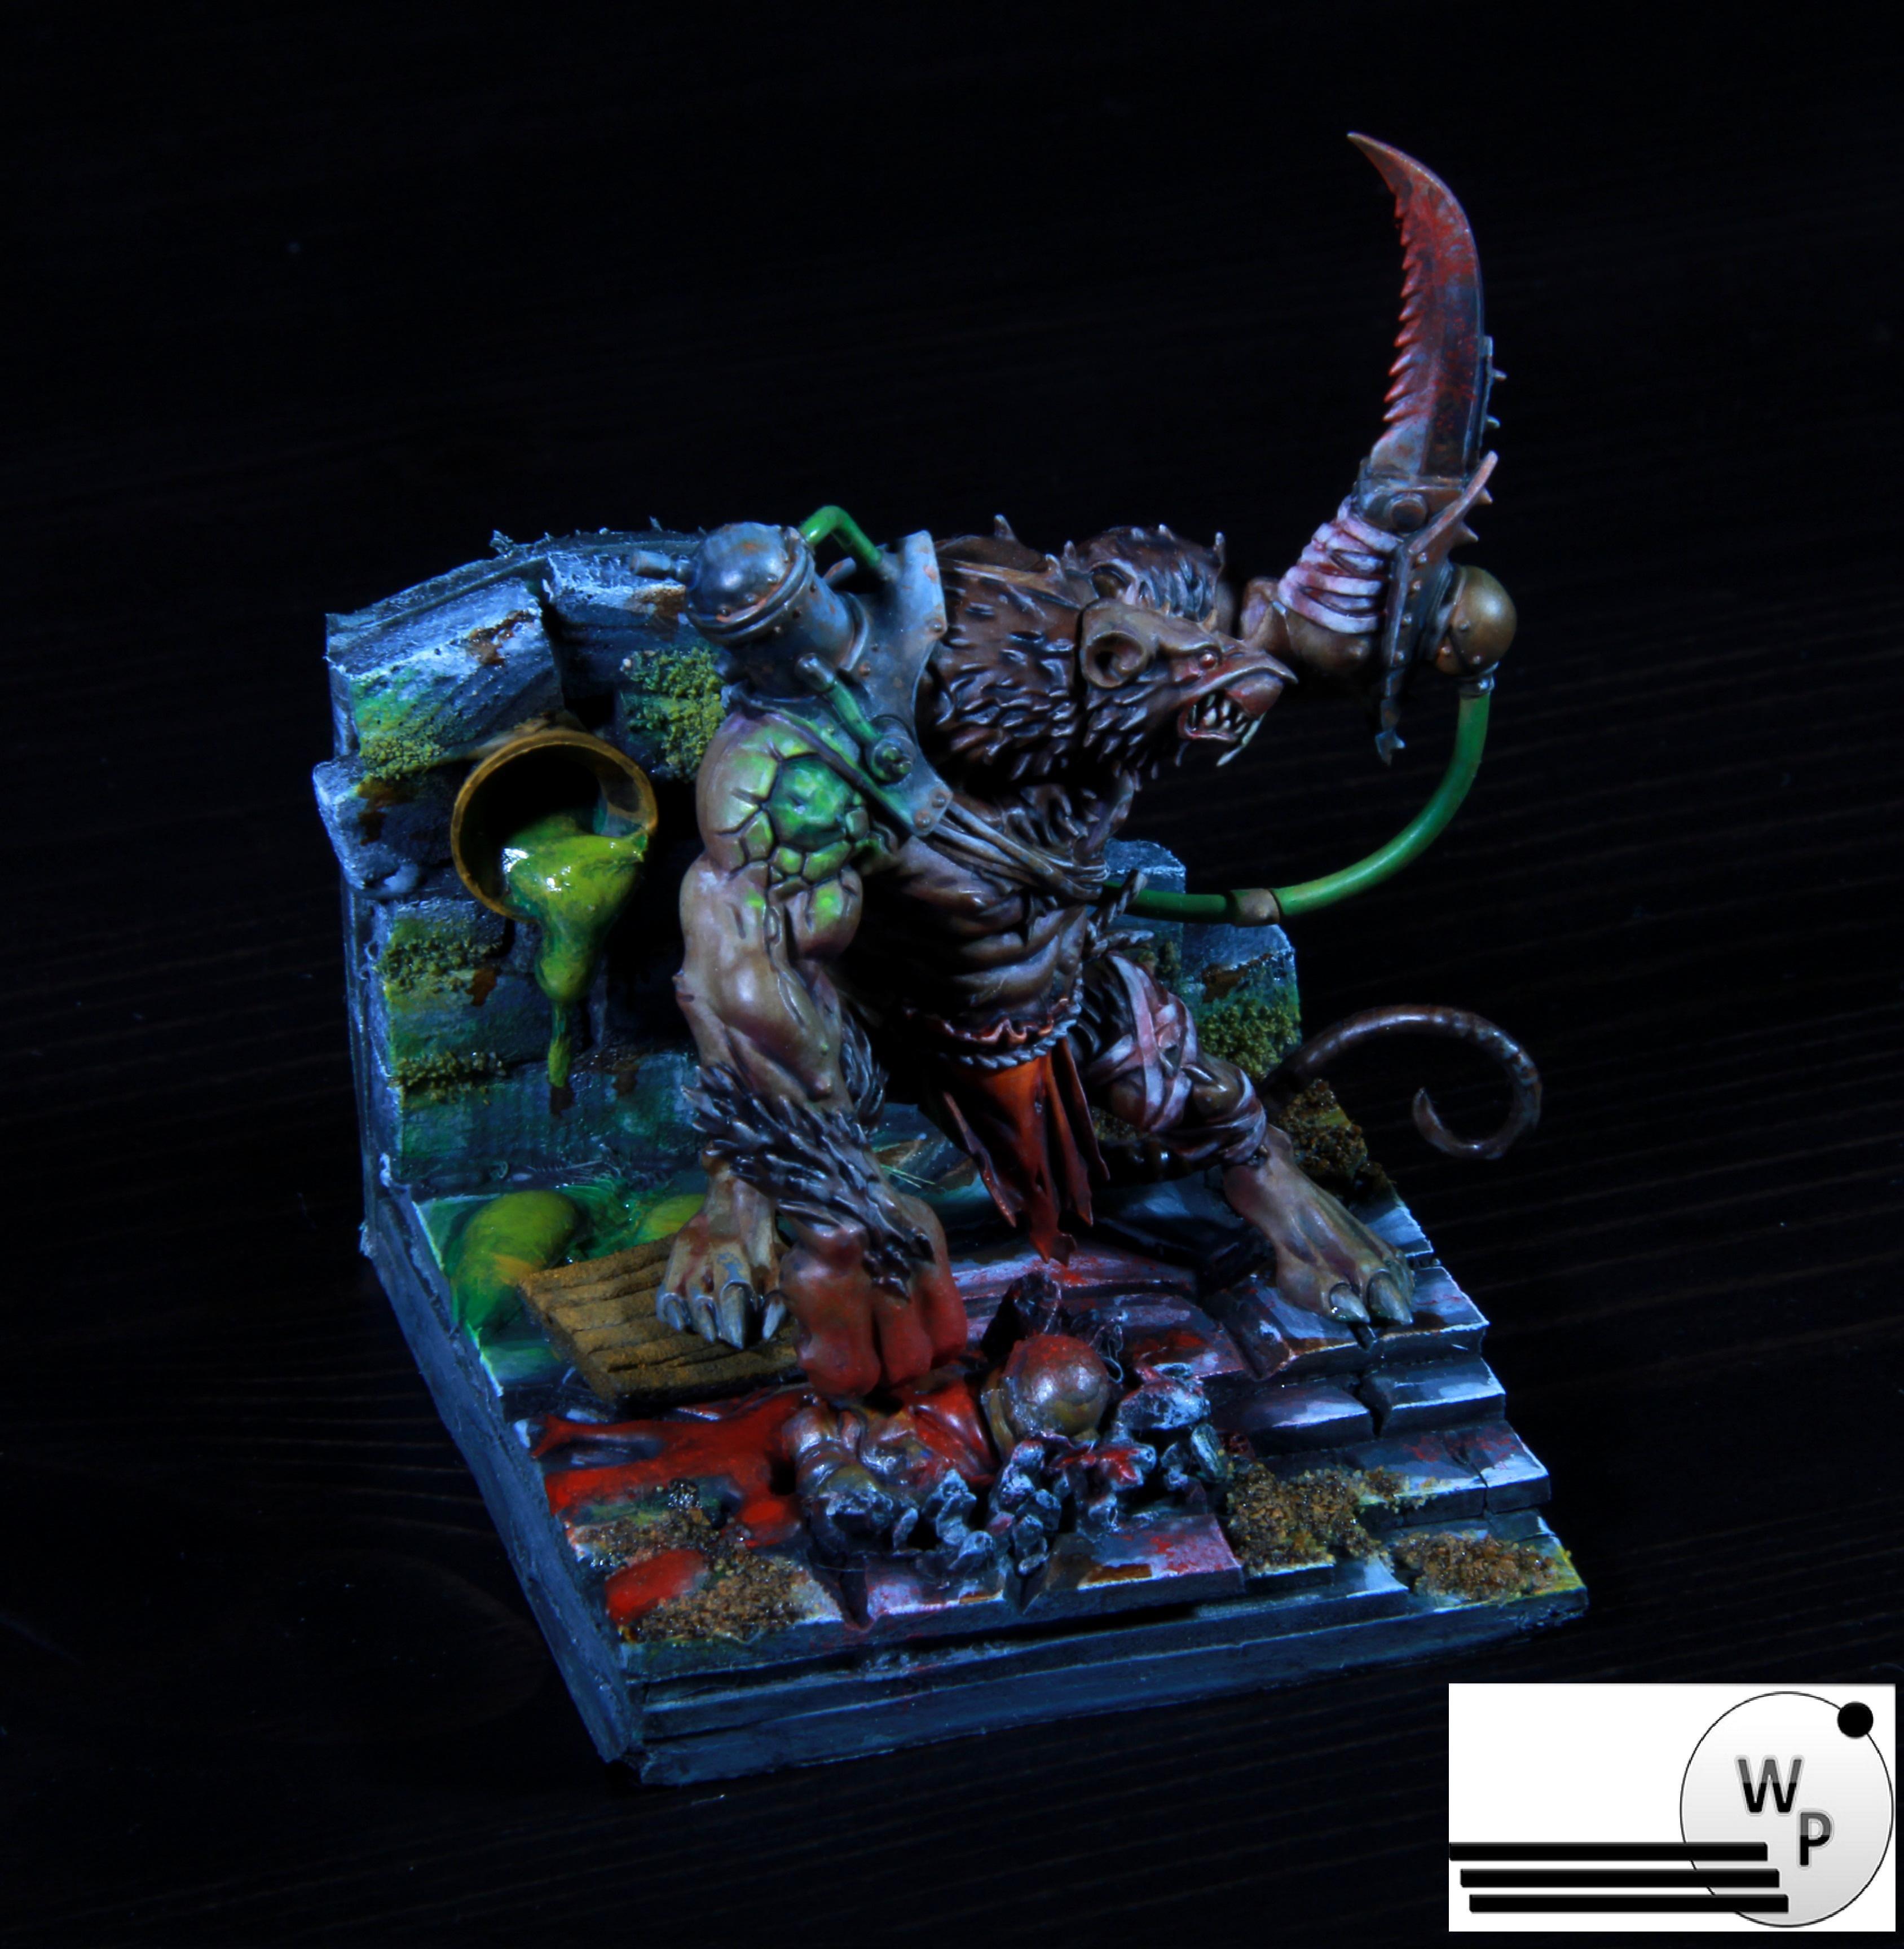 Eavy, Golden Tom, Metal, Ogres, Paintjob, Rat, Skaven, Warhammer 40,000, Warhammer Fantasy